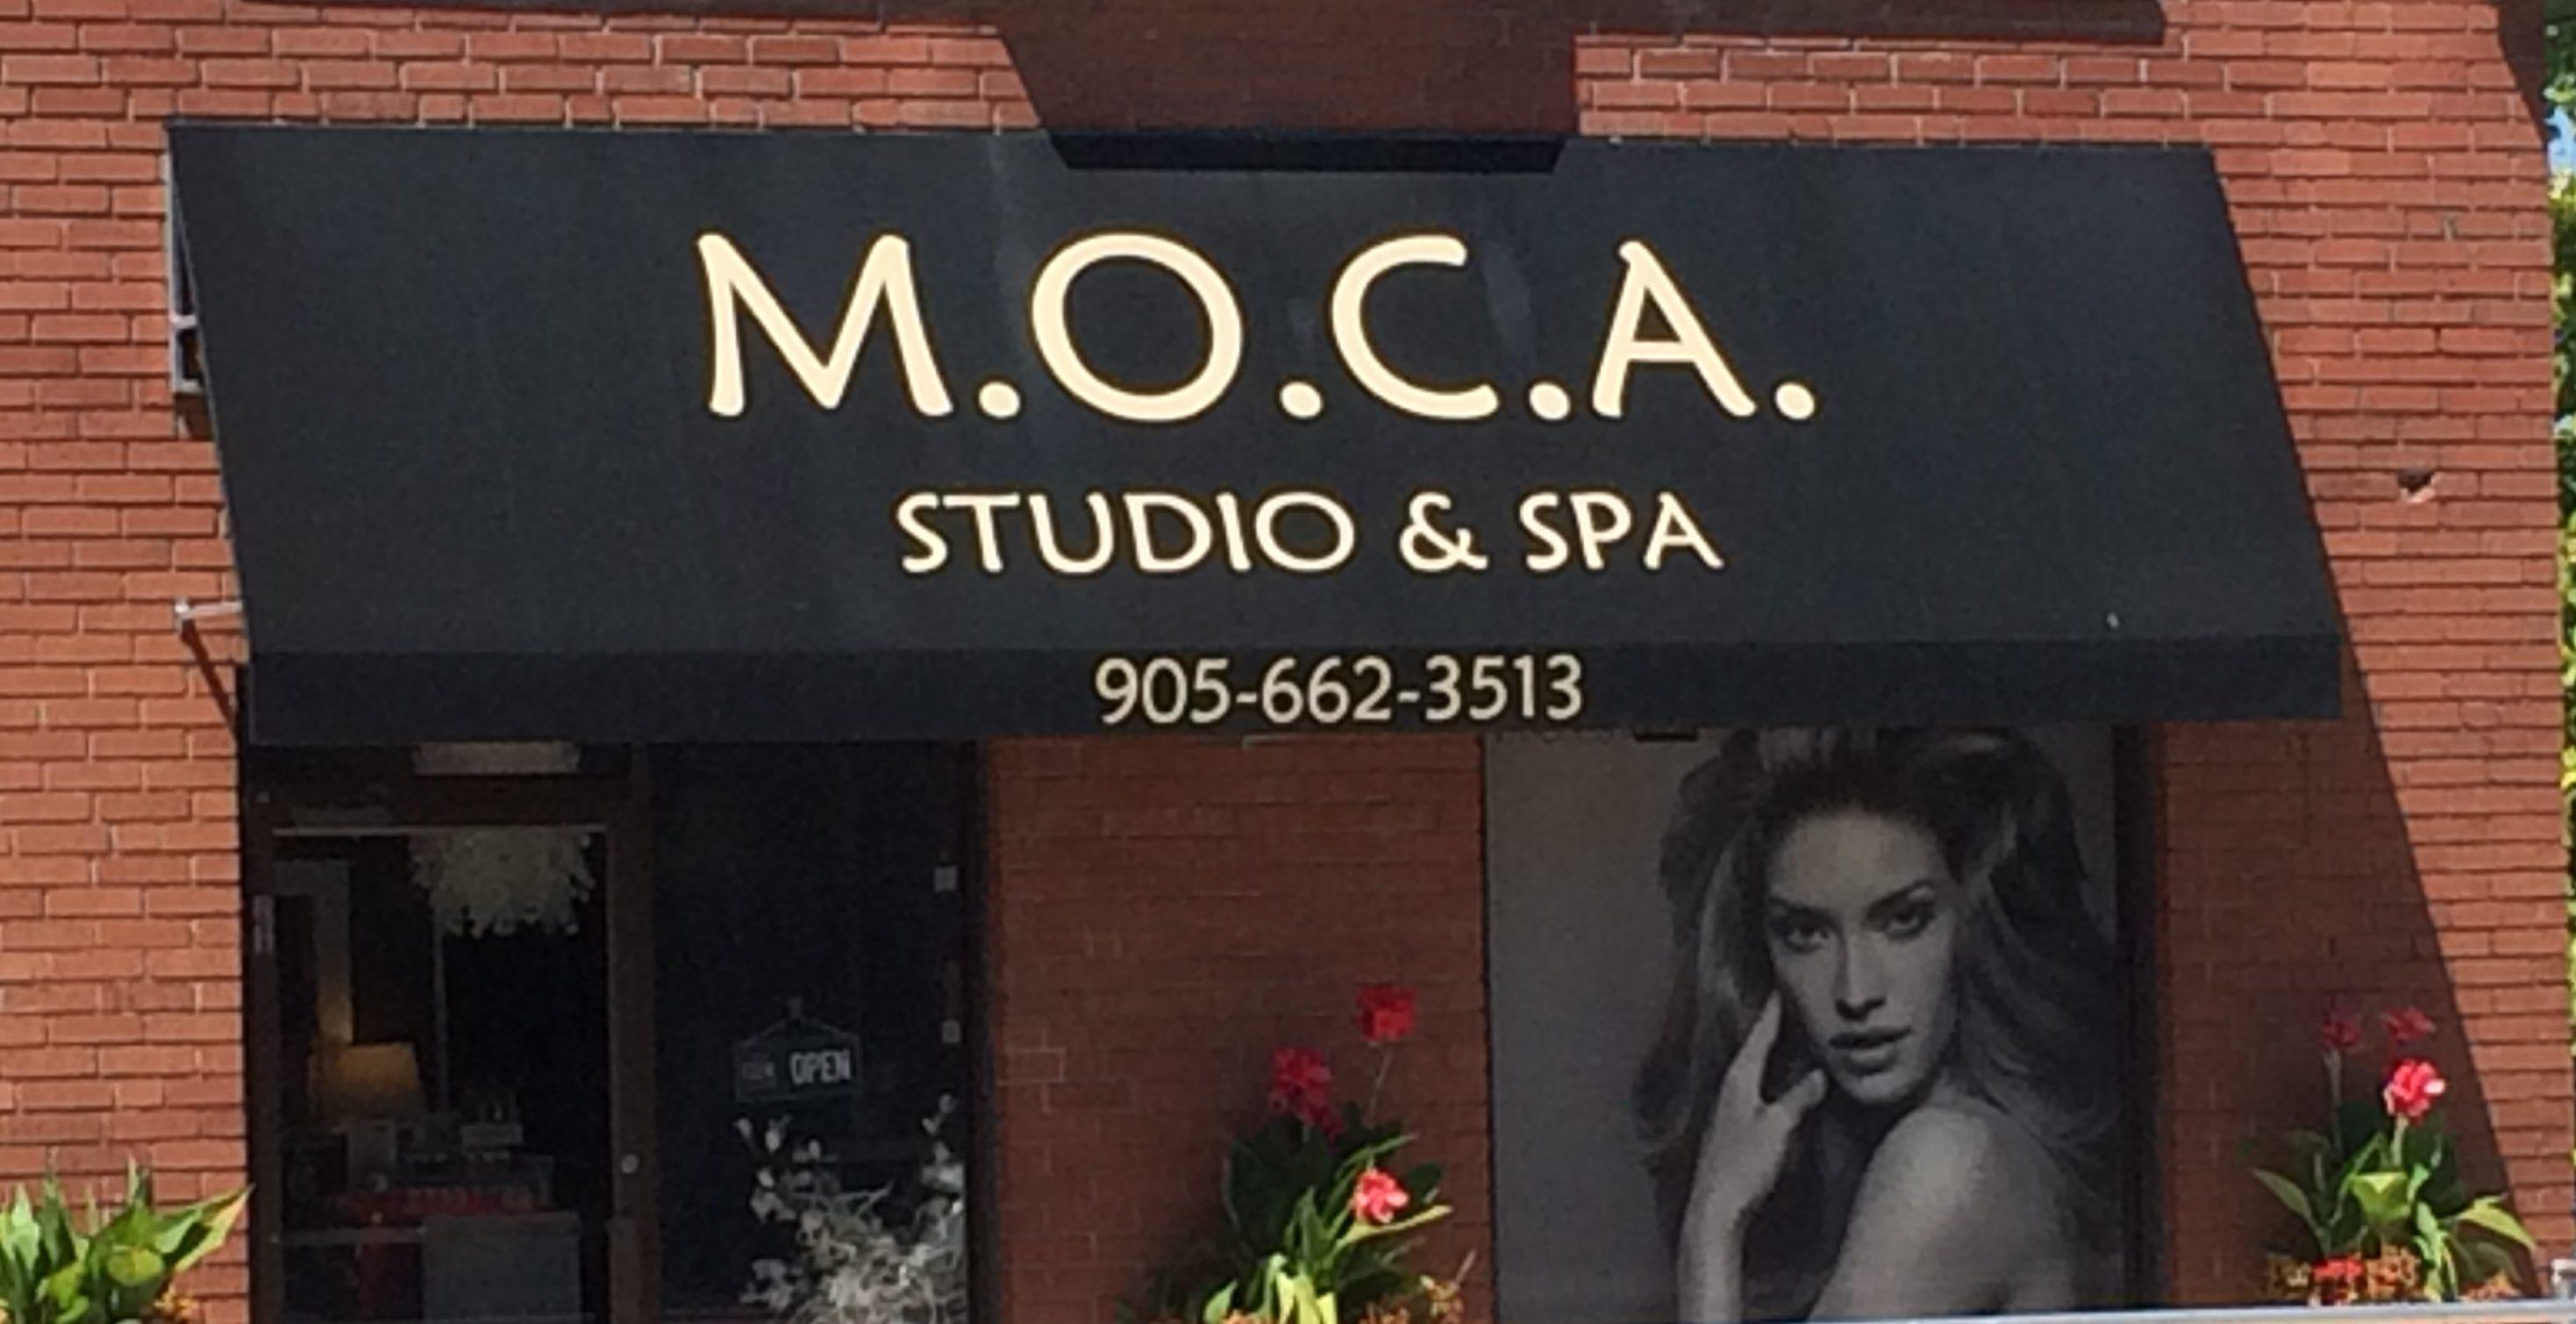 Moca Studio & Spa